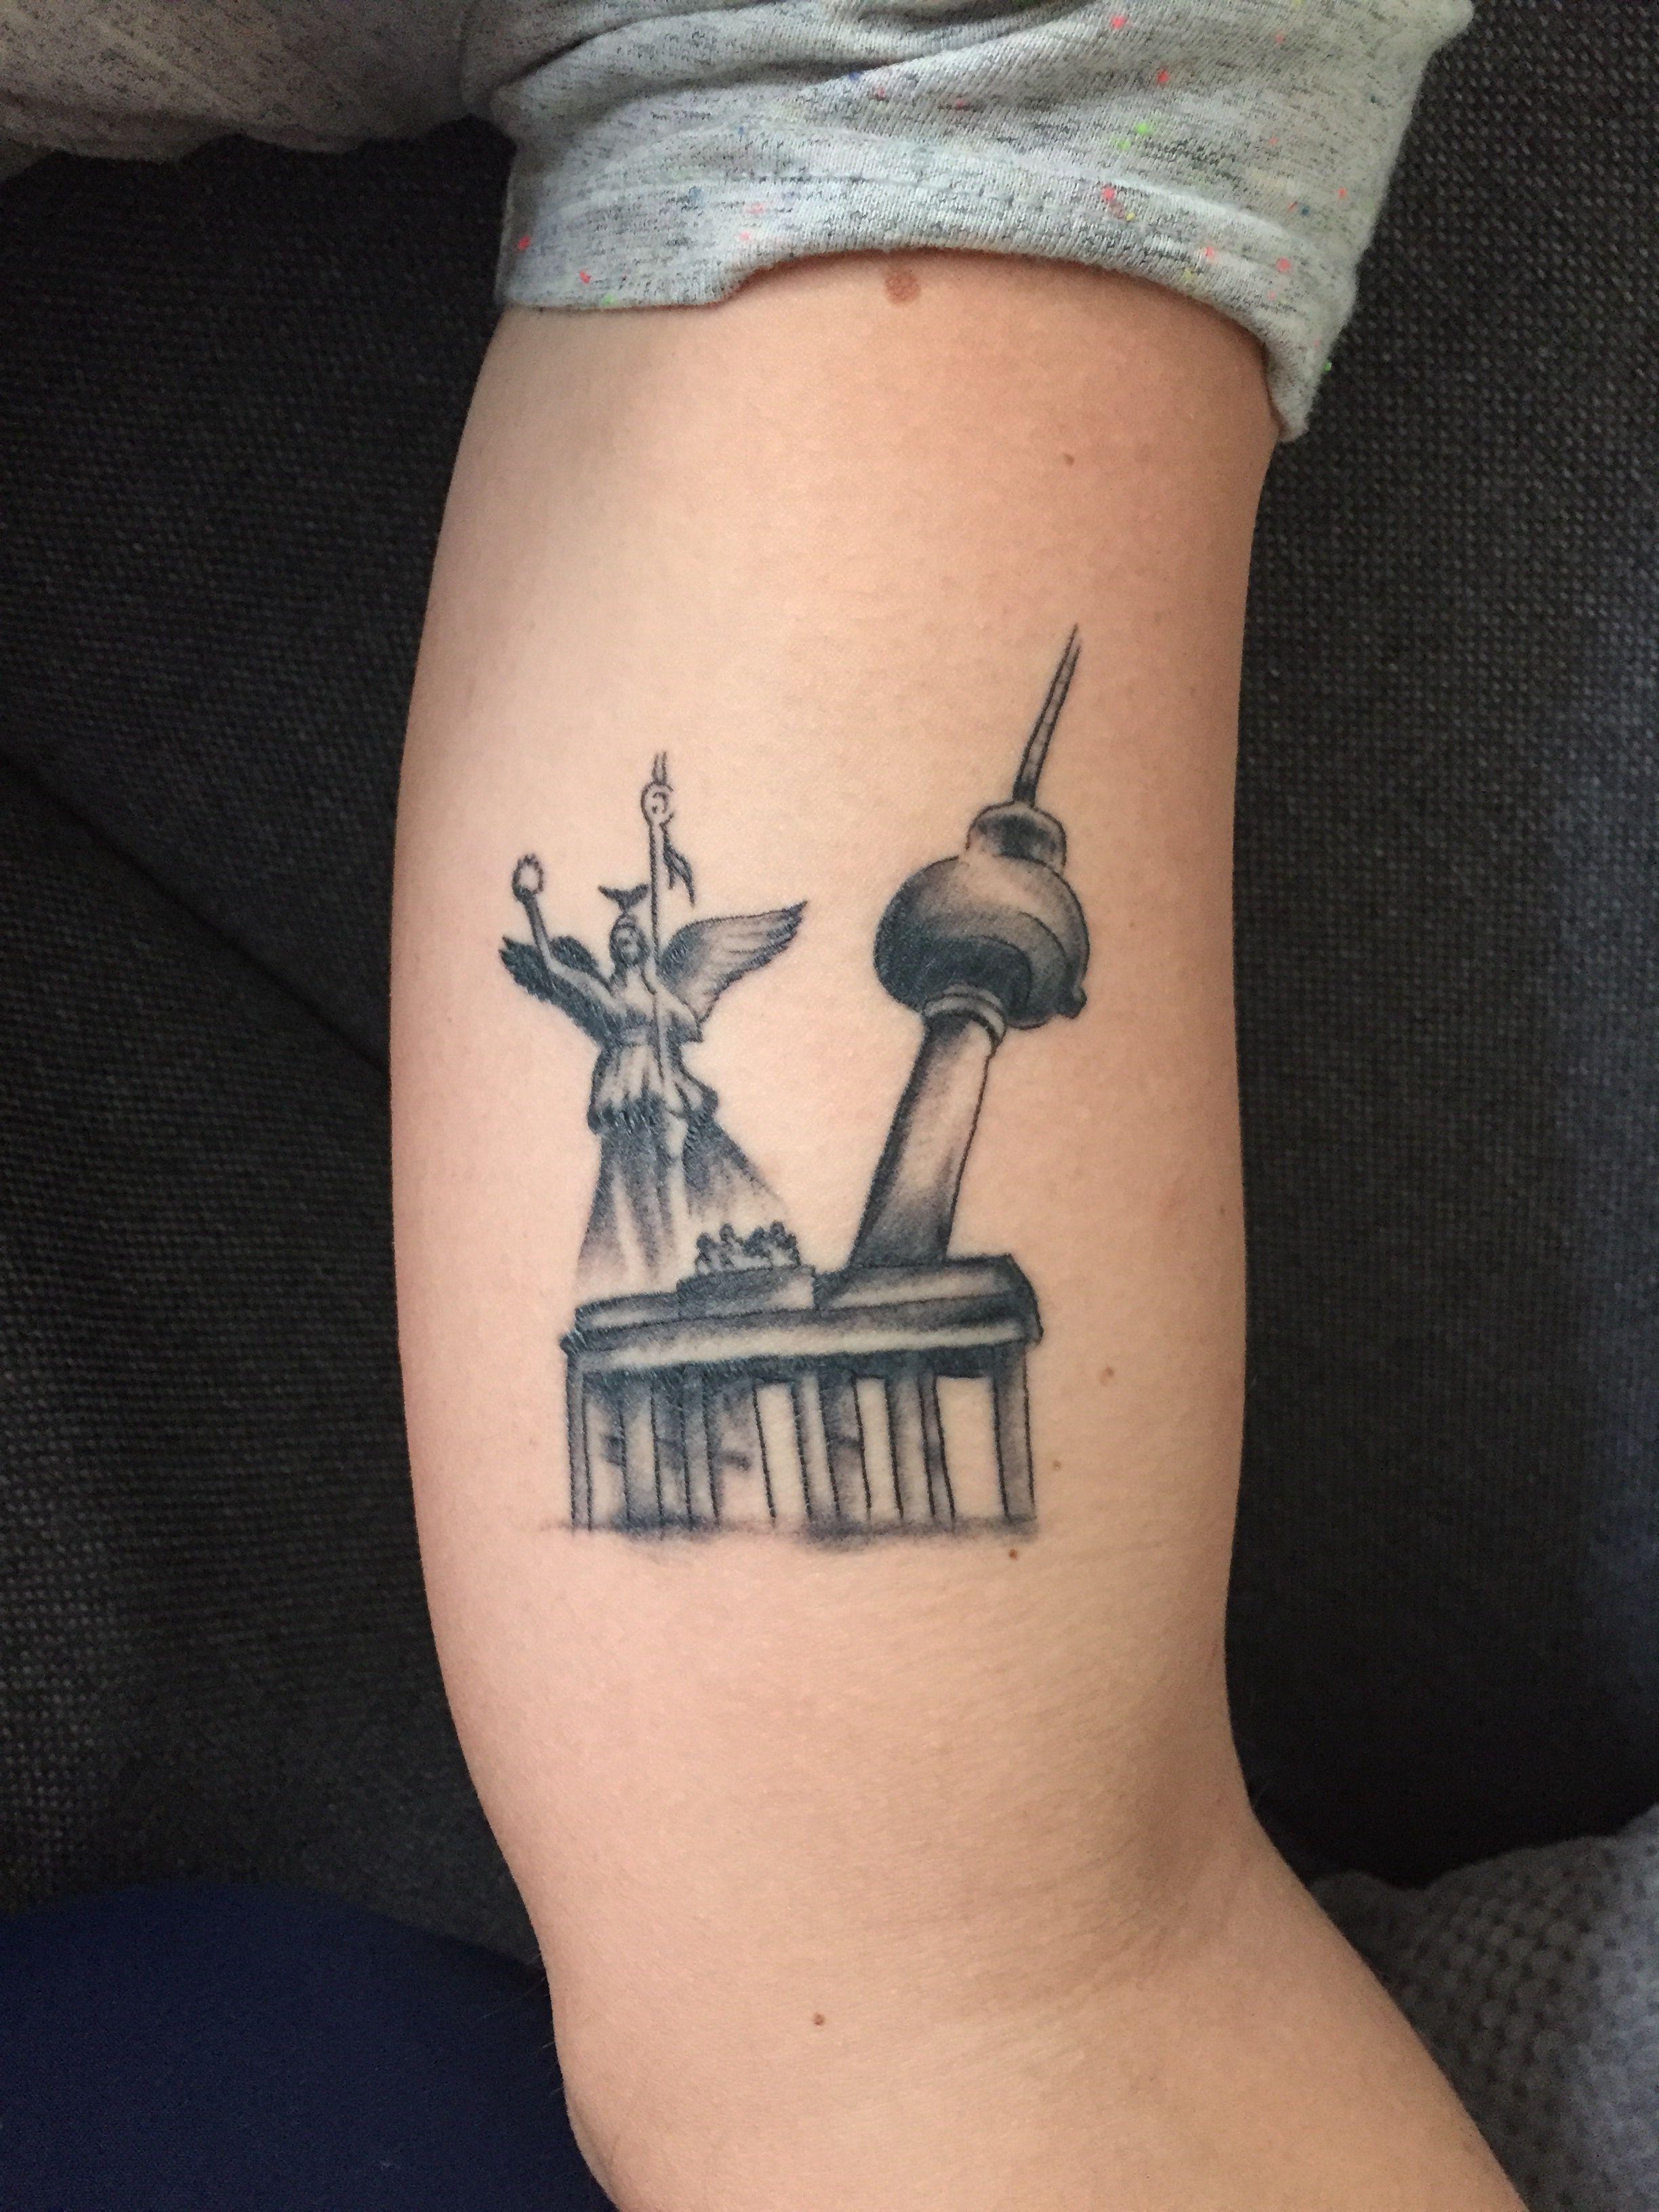 Tattoo Berlin Brandenburger Tor Fernsehturm Siegesaule Berlin Tattoo Fernsehturm Brandenburger Tor Alternati In 2020 Tattoos Animal Tattoo Tattoo Designs